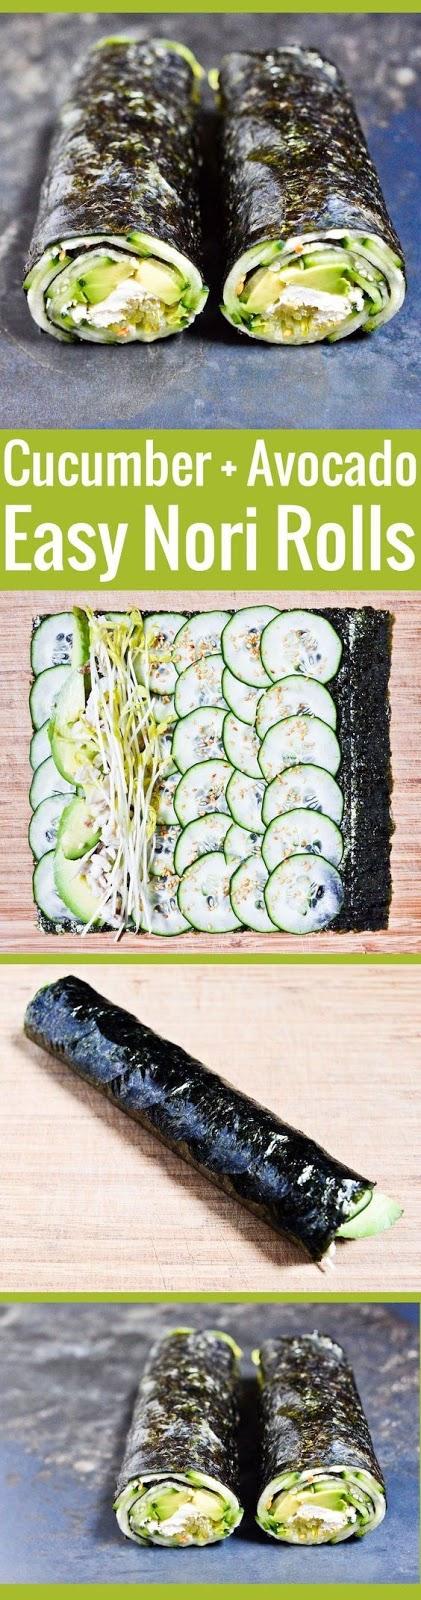 Nori Roll with Cucumber and Avocado Recipe #Nori #Roll #with #Cucumber #and #Avocado #Recipe #Nori# Roll #Cucumber #Avocado #Recipe #Healthy